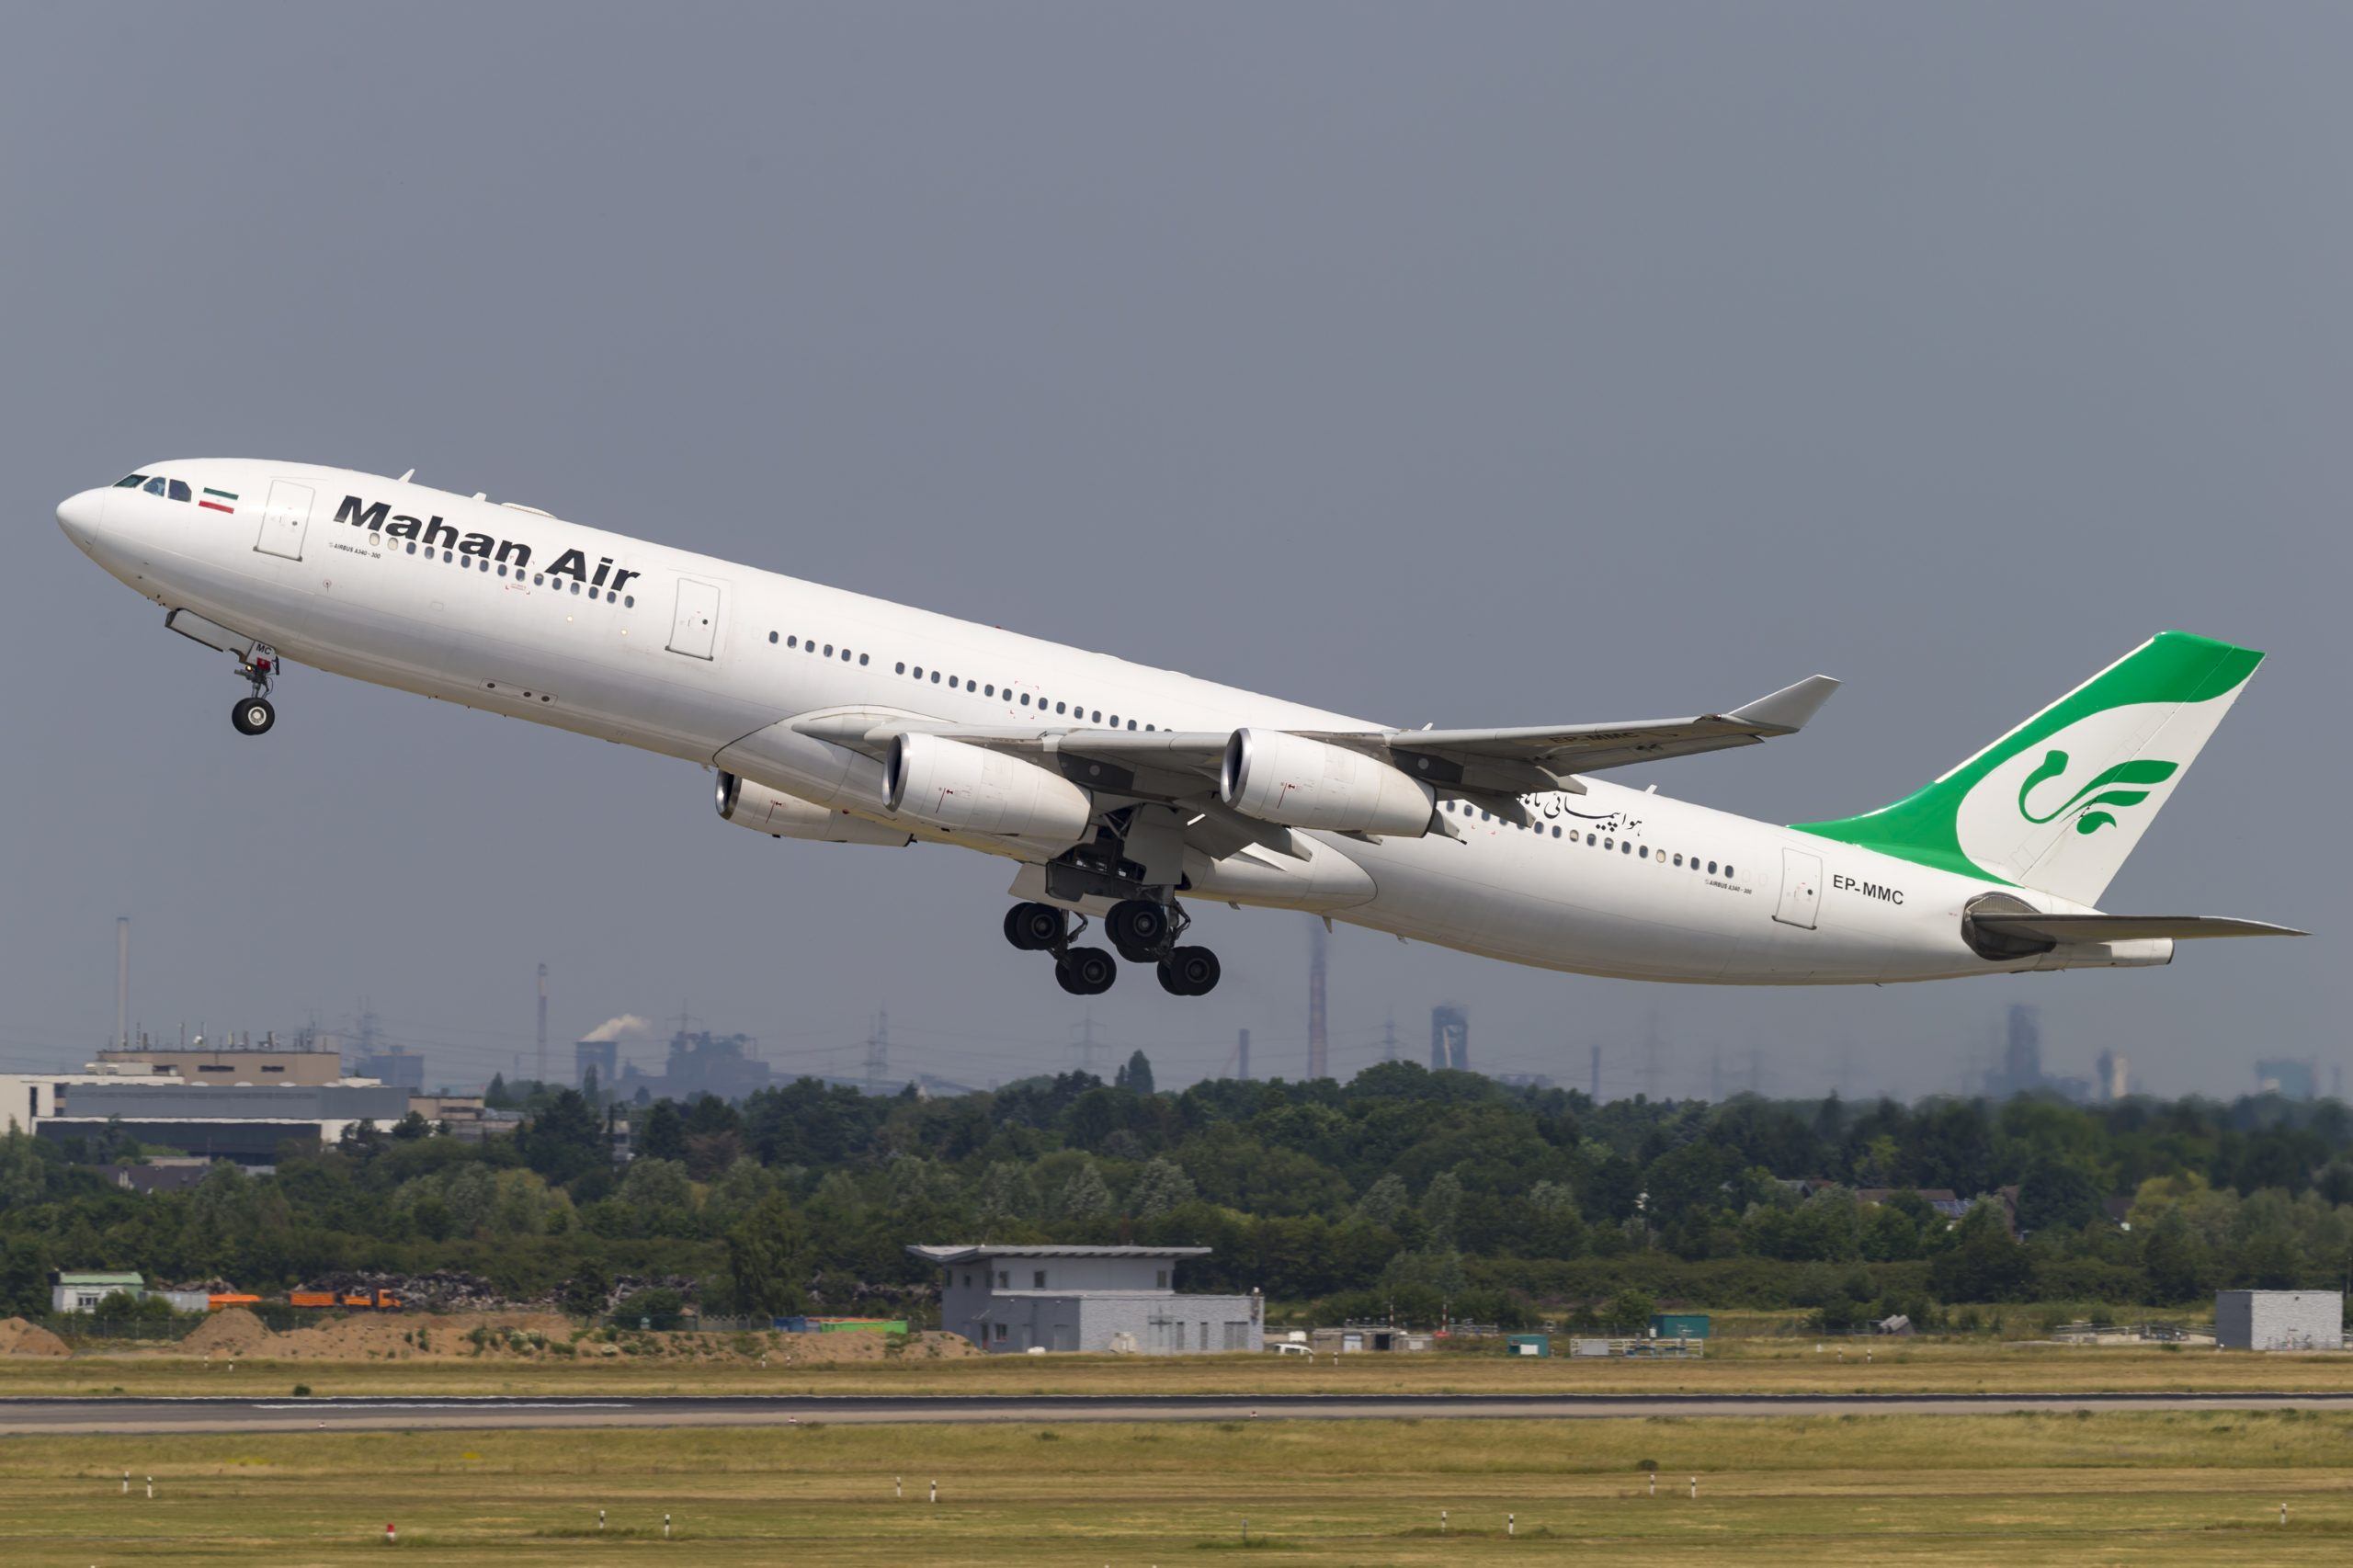 Airbus A340-300 fra Mahan Air. (Foto: © Thorbjørn Brunander Sund, Danish Aviation Photo)